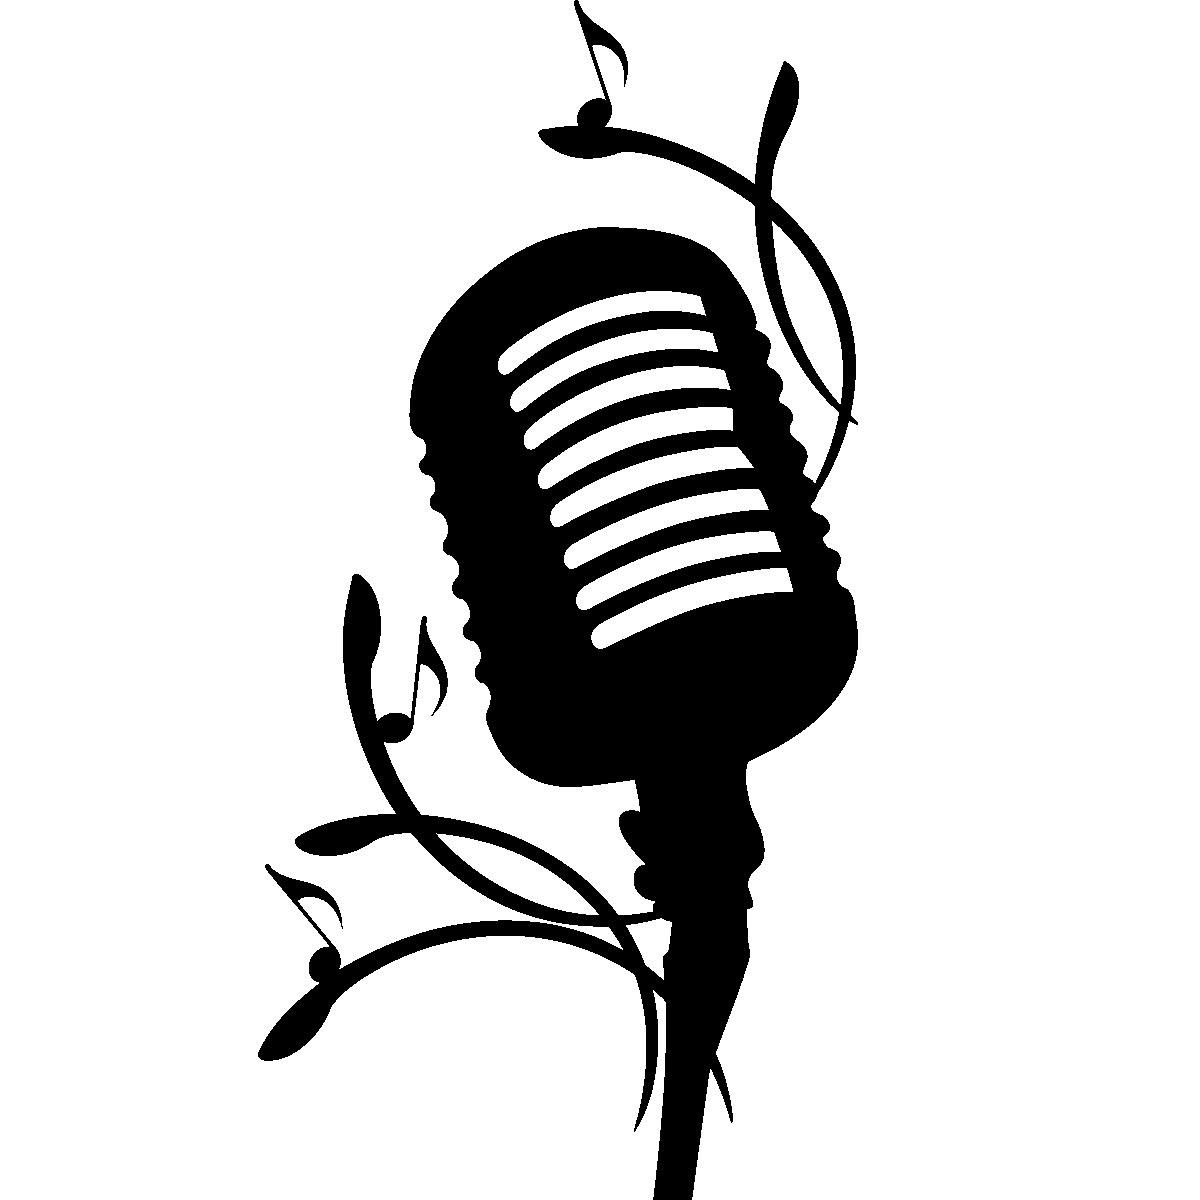 Microphone Silhouette Line Clip art.